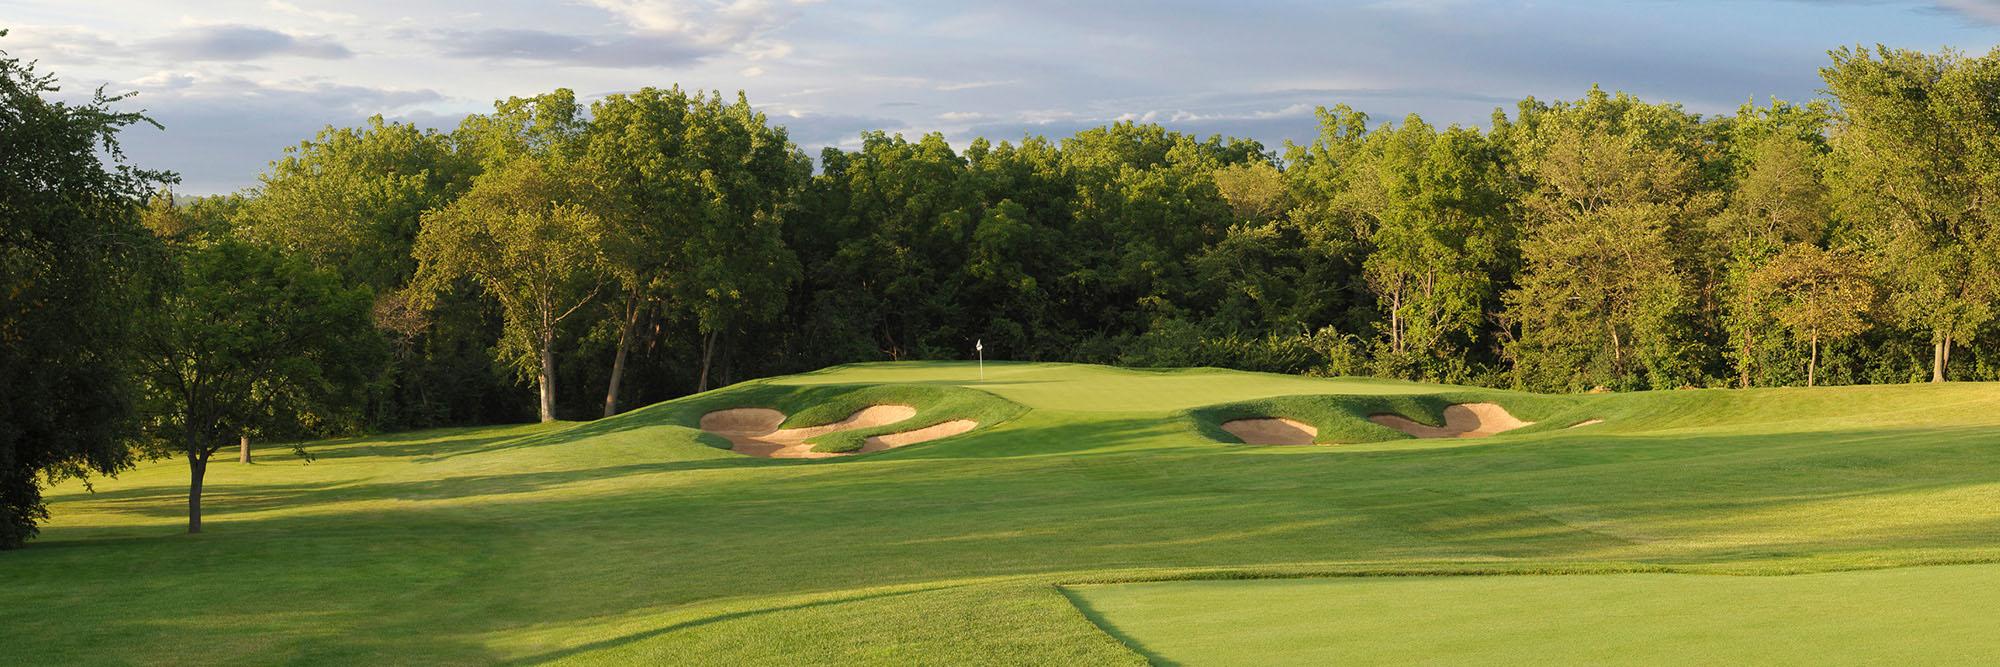 Golf Course Image - Cog Hill 4 No. 12